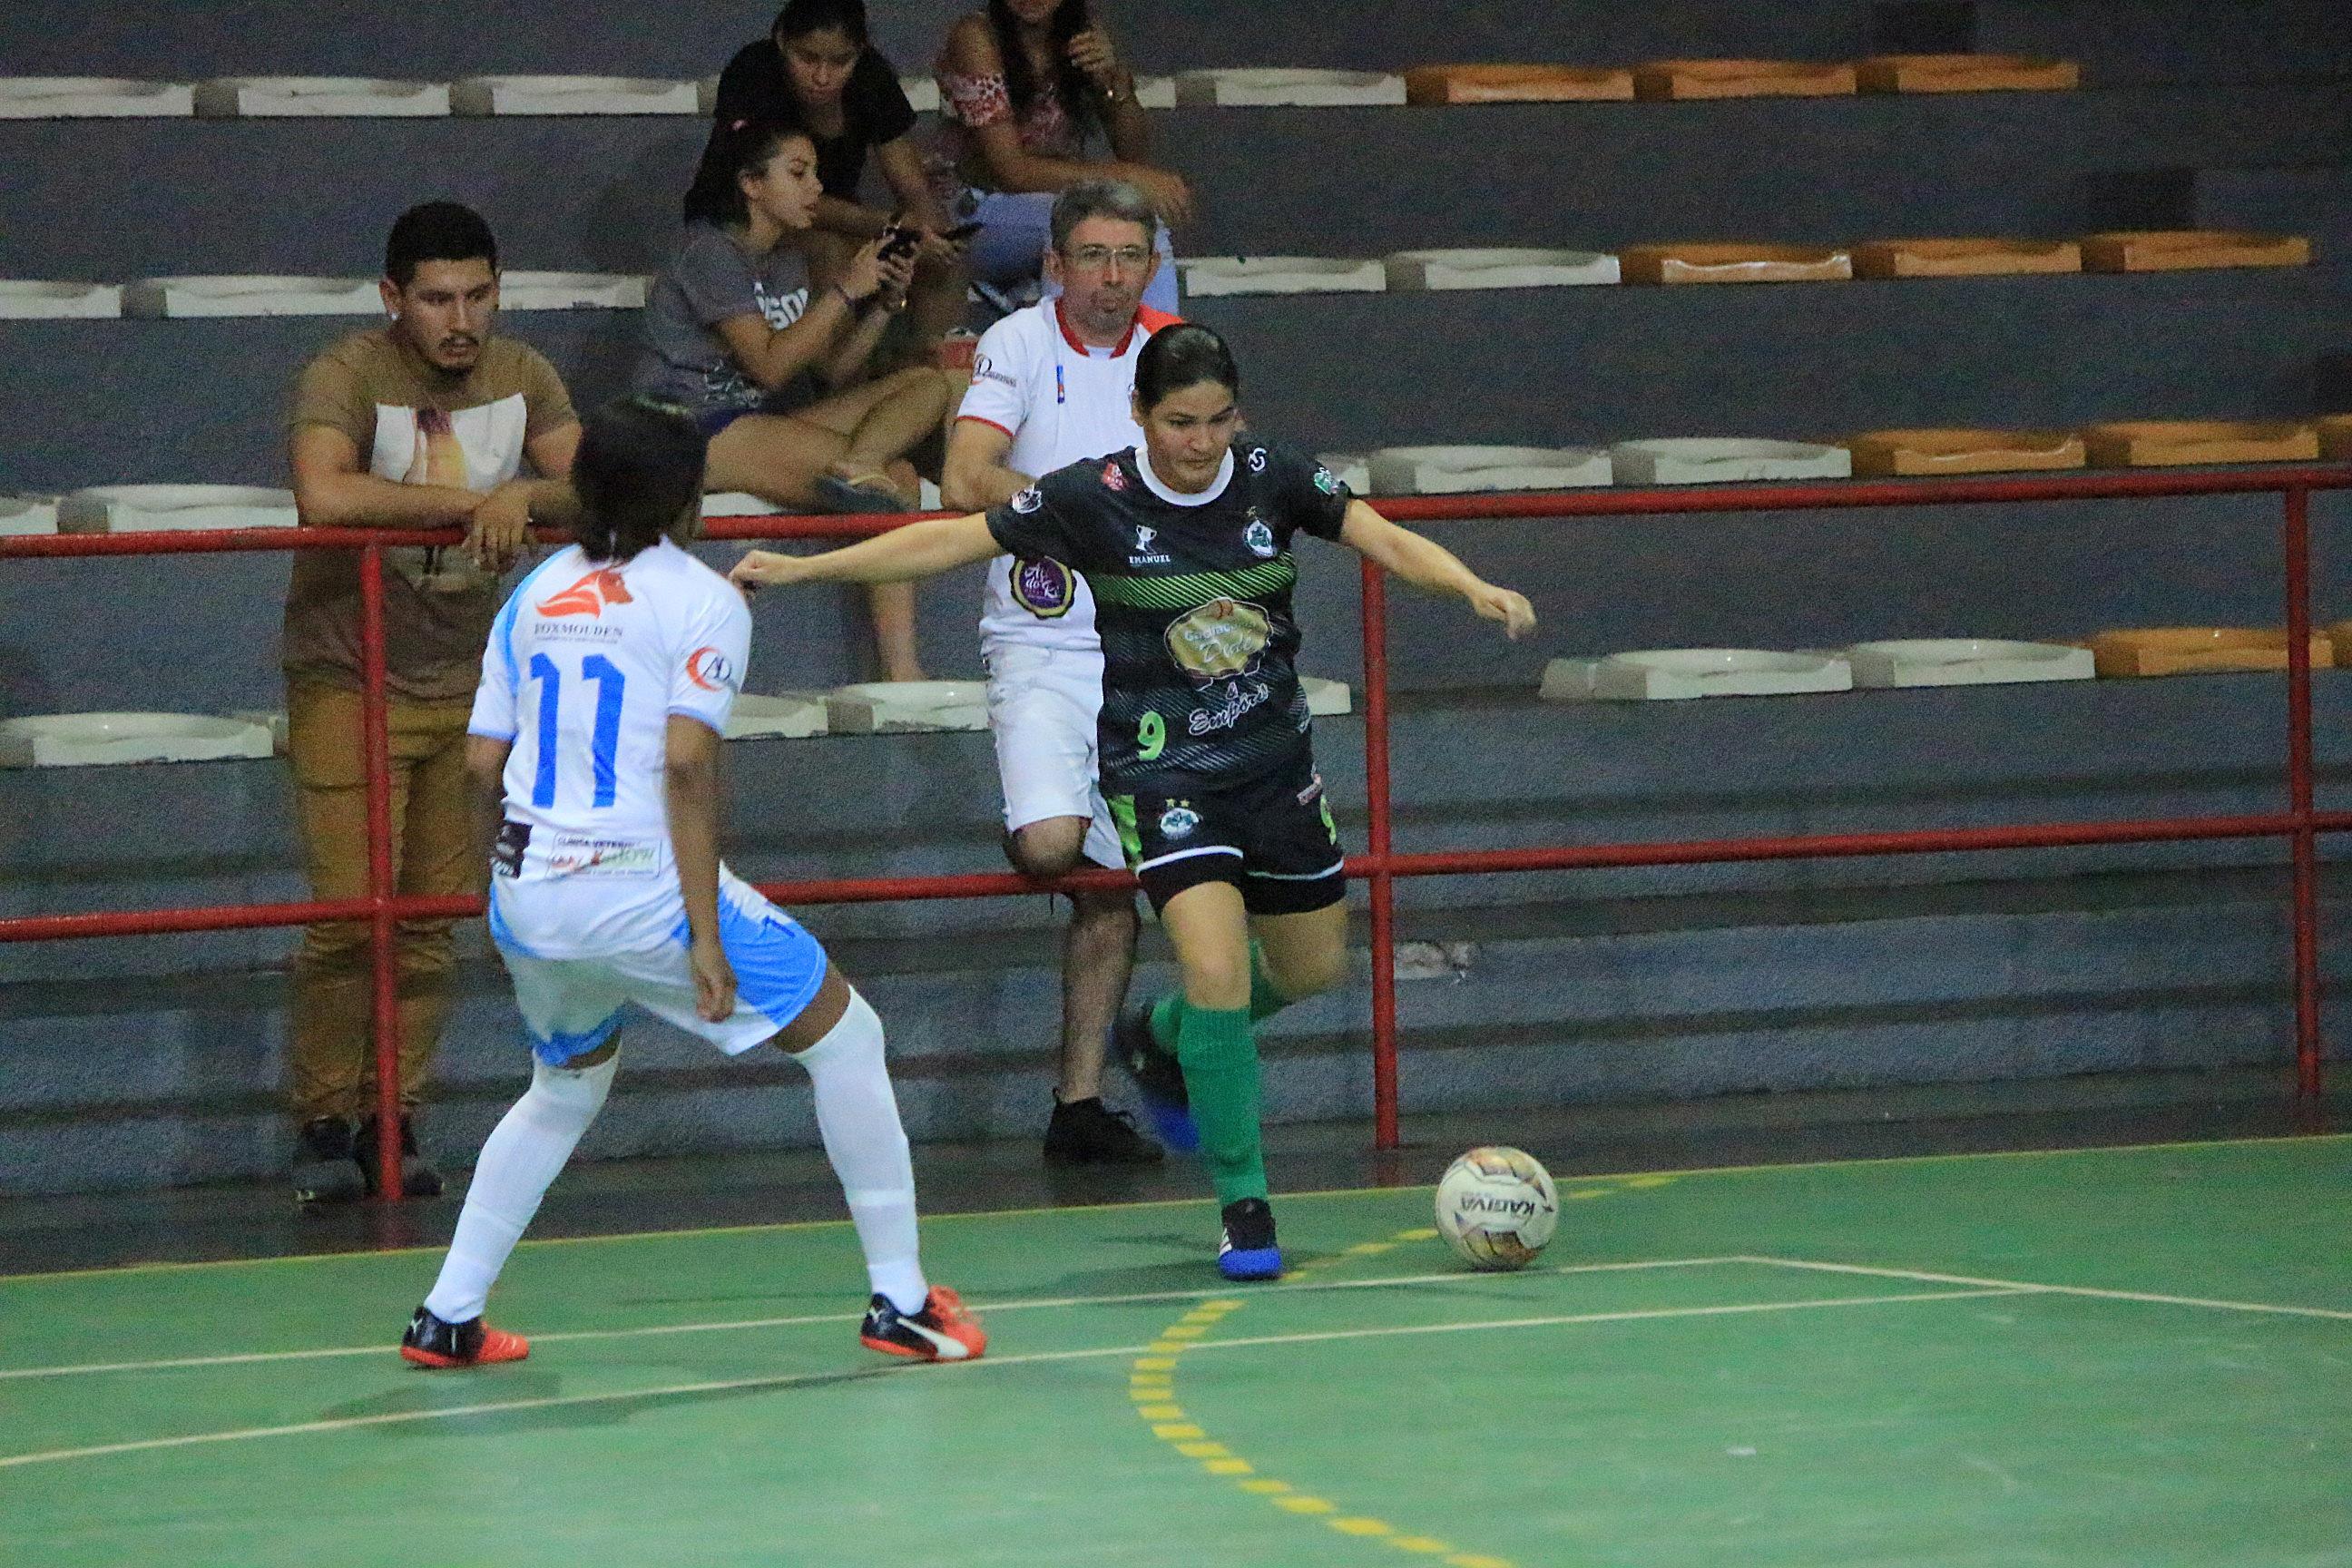 ... Futsal Adulto Feminino começa na noite desta segunda-feira 8892bd420b85a